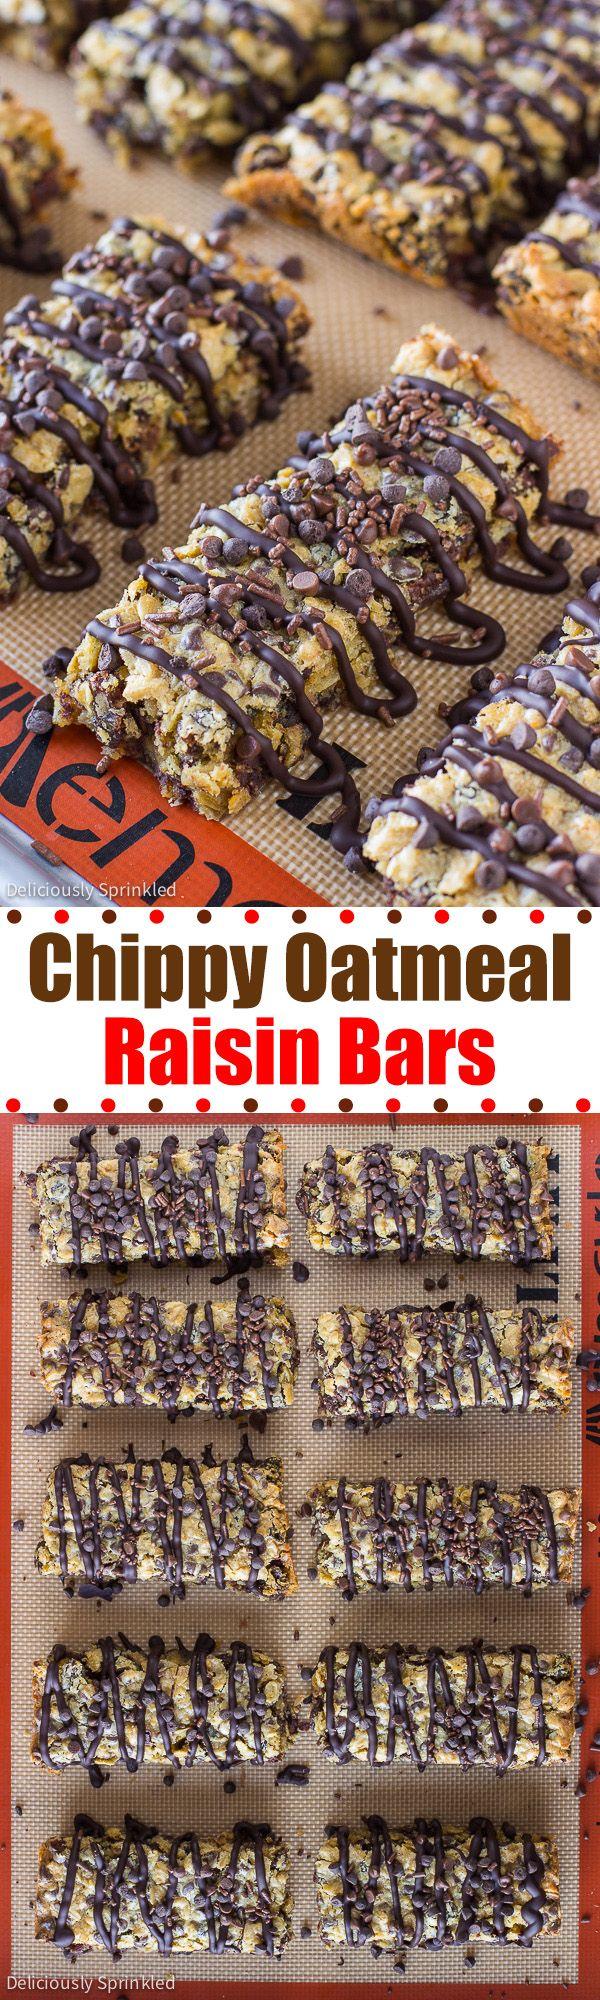 Chocolate Chip Oatmeal Raisin Bars